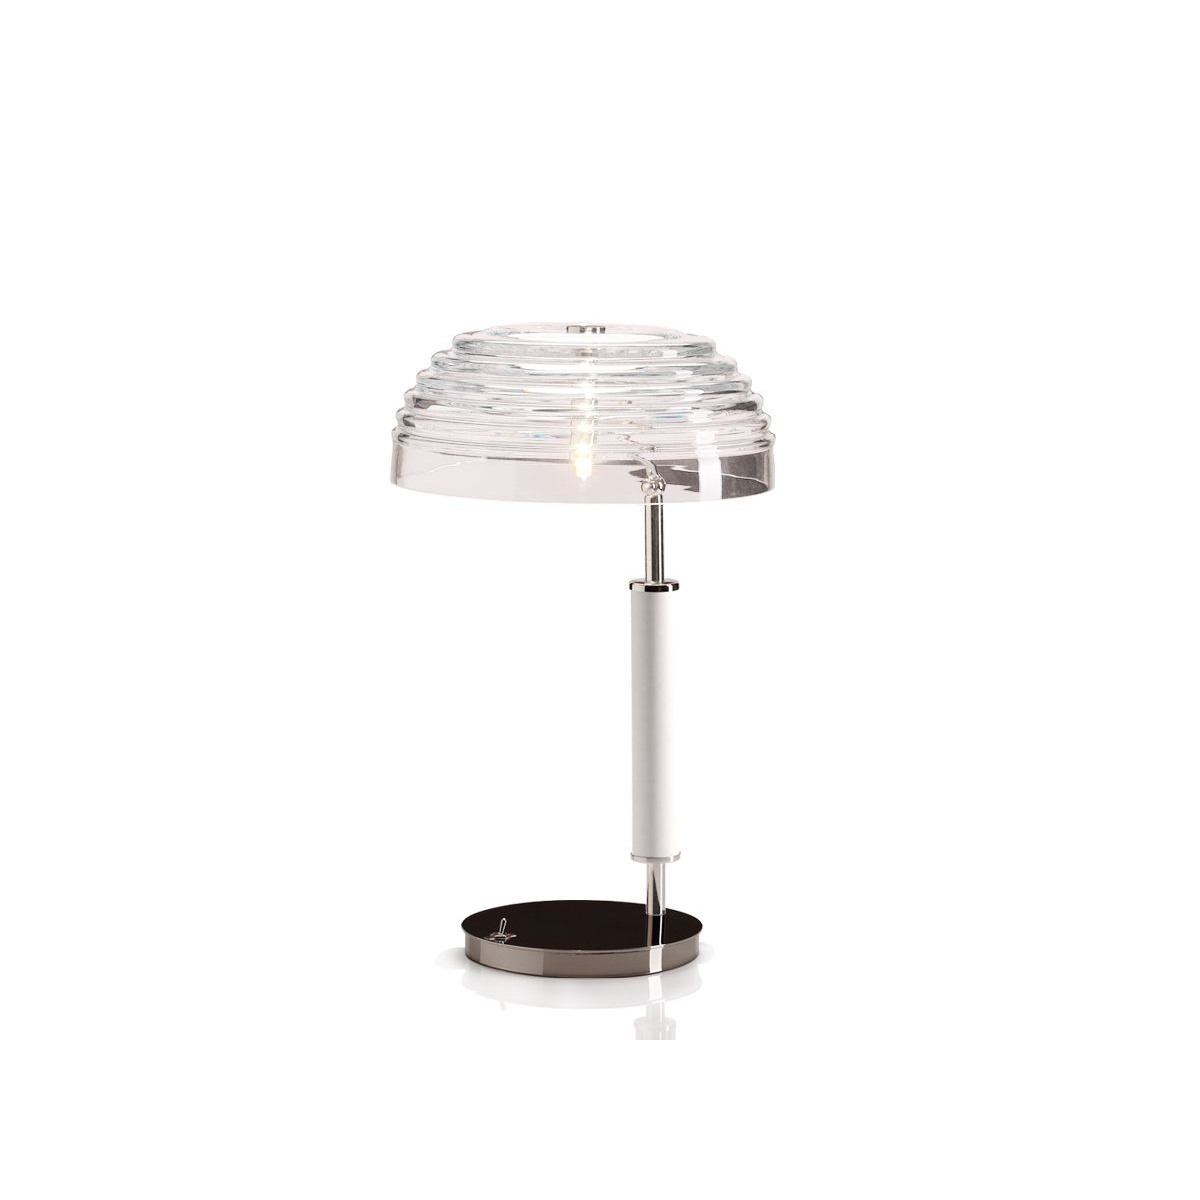 Art deco table lamp nina swanky interiors villa lumi lighting art deco table lamp nina geotapseo Gallery